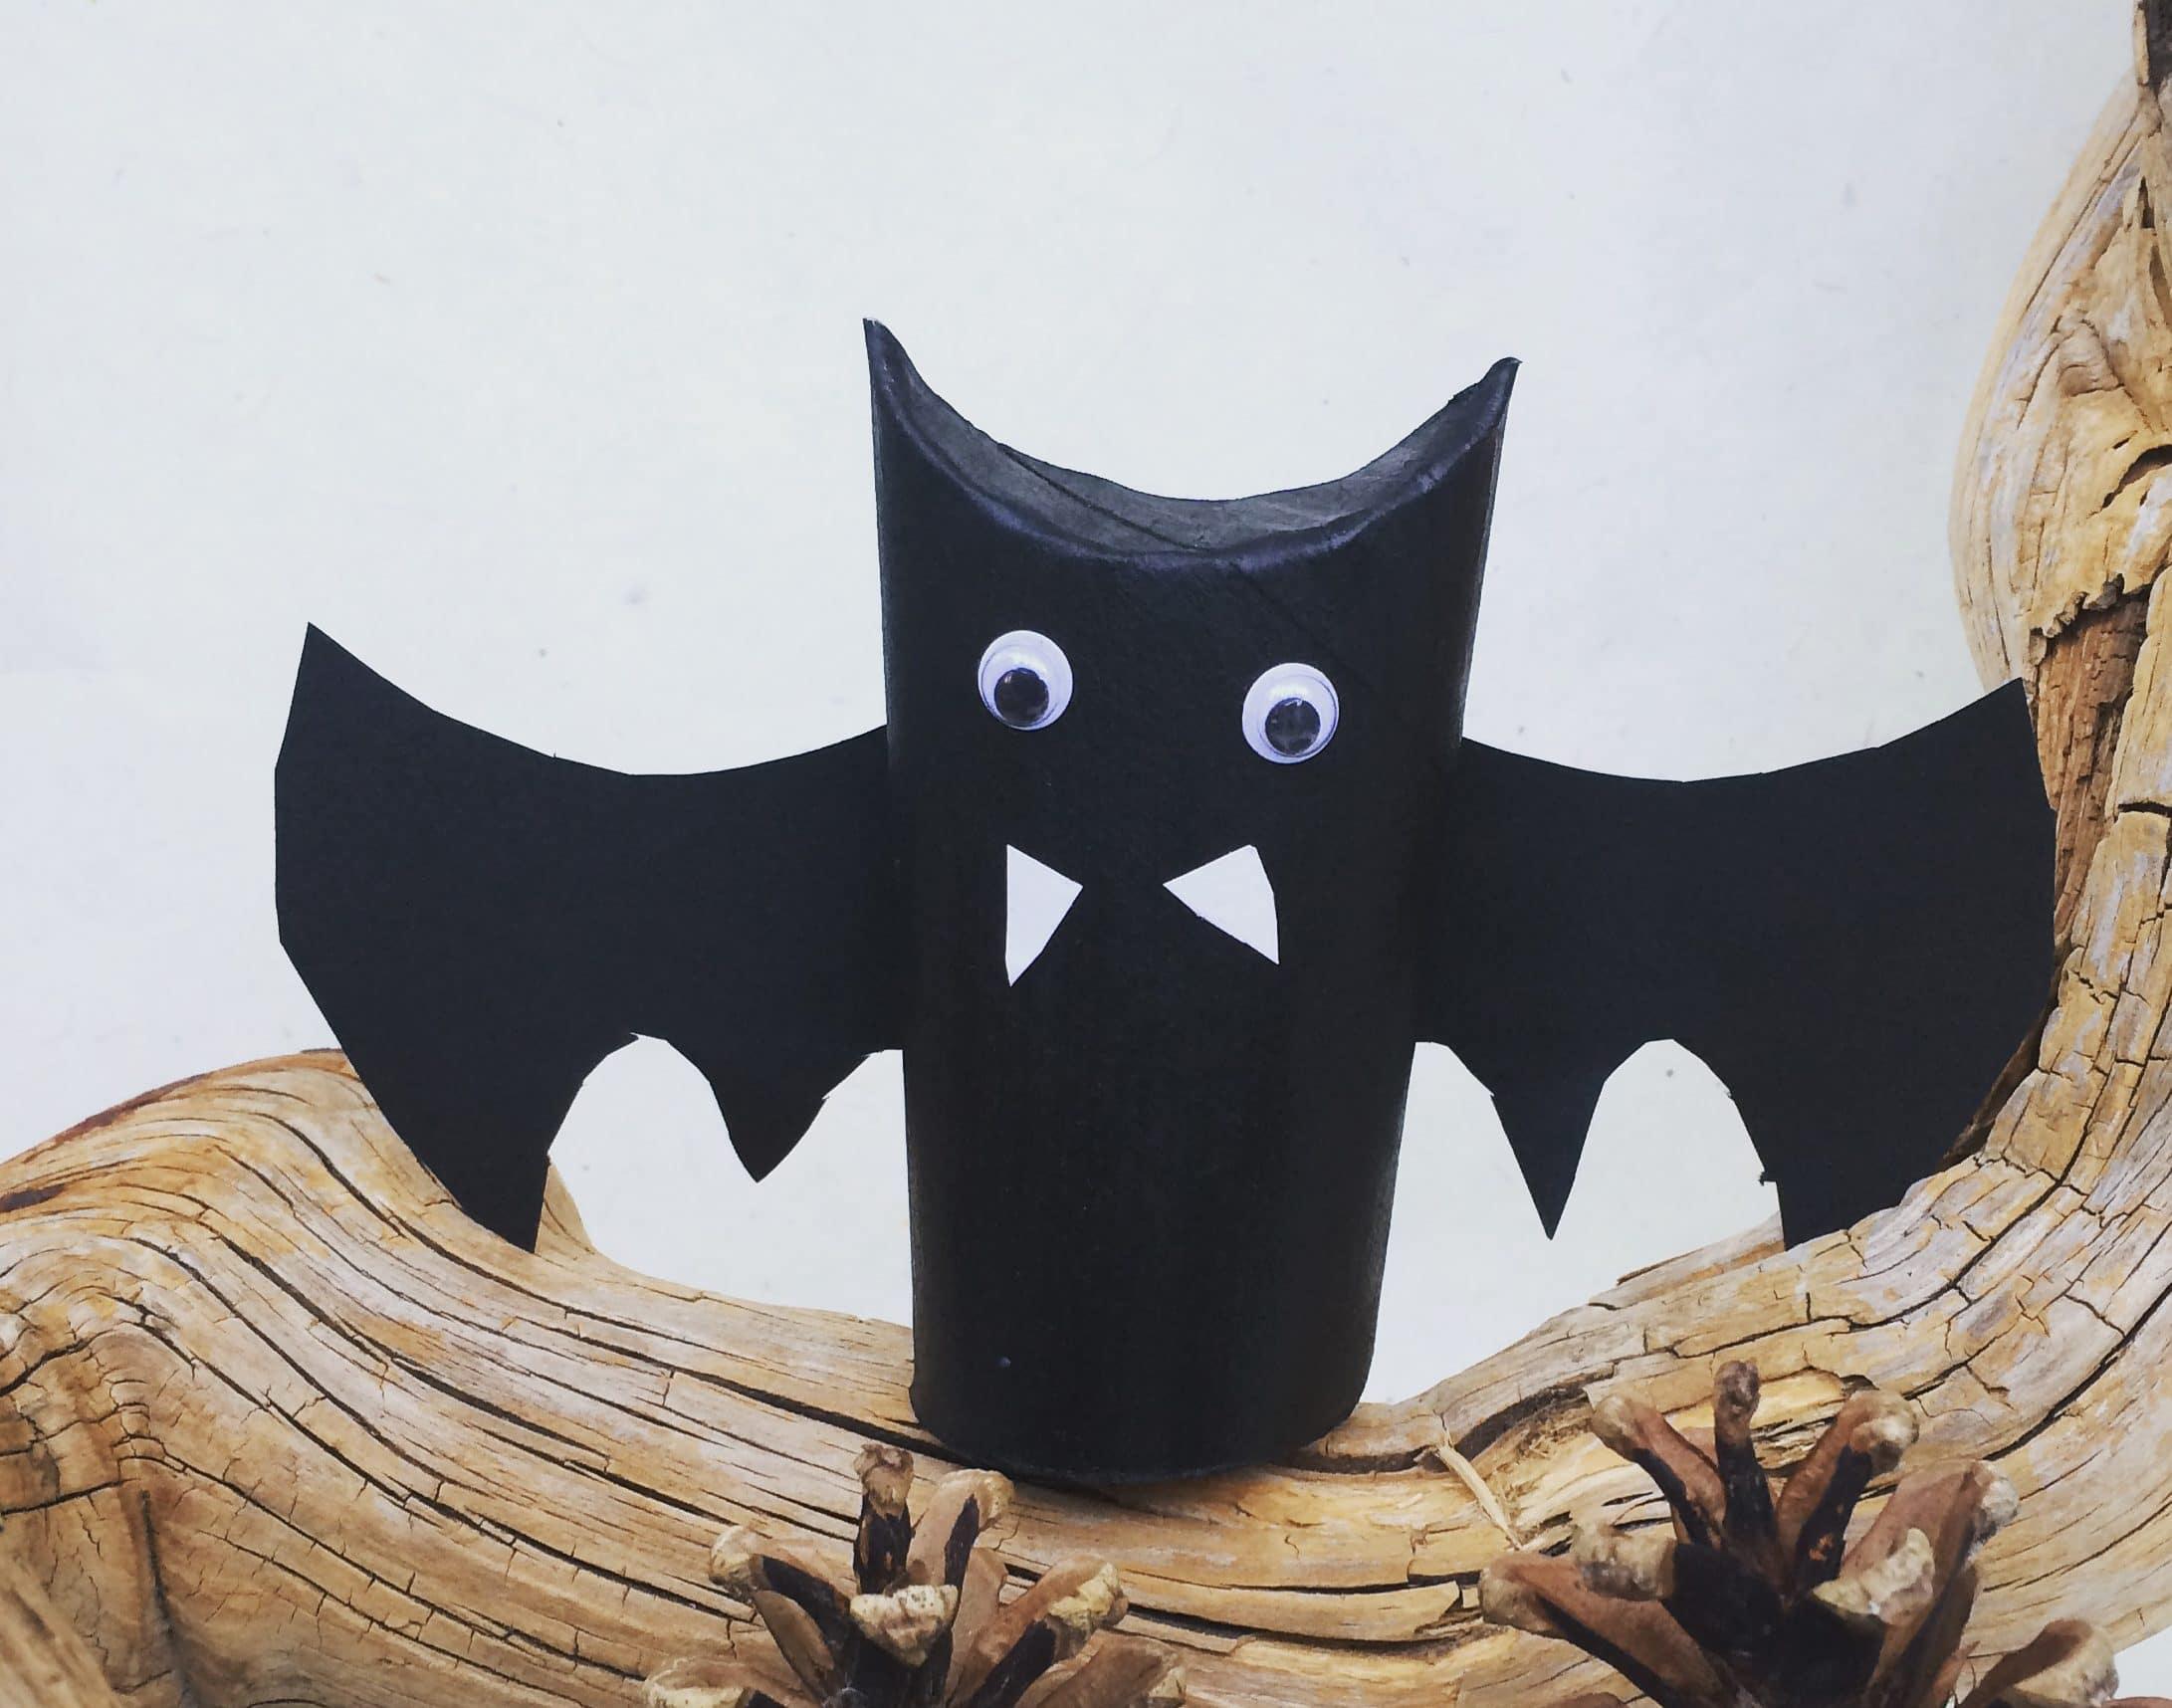 Fledermaus aus Klorolle basteln, Halloween